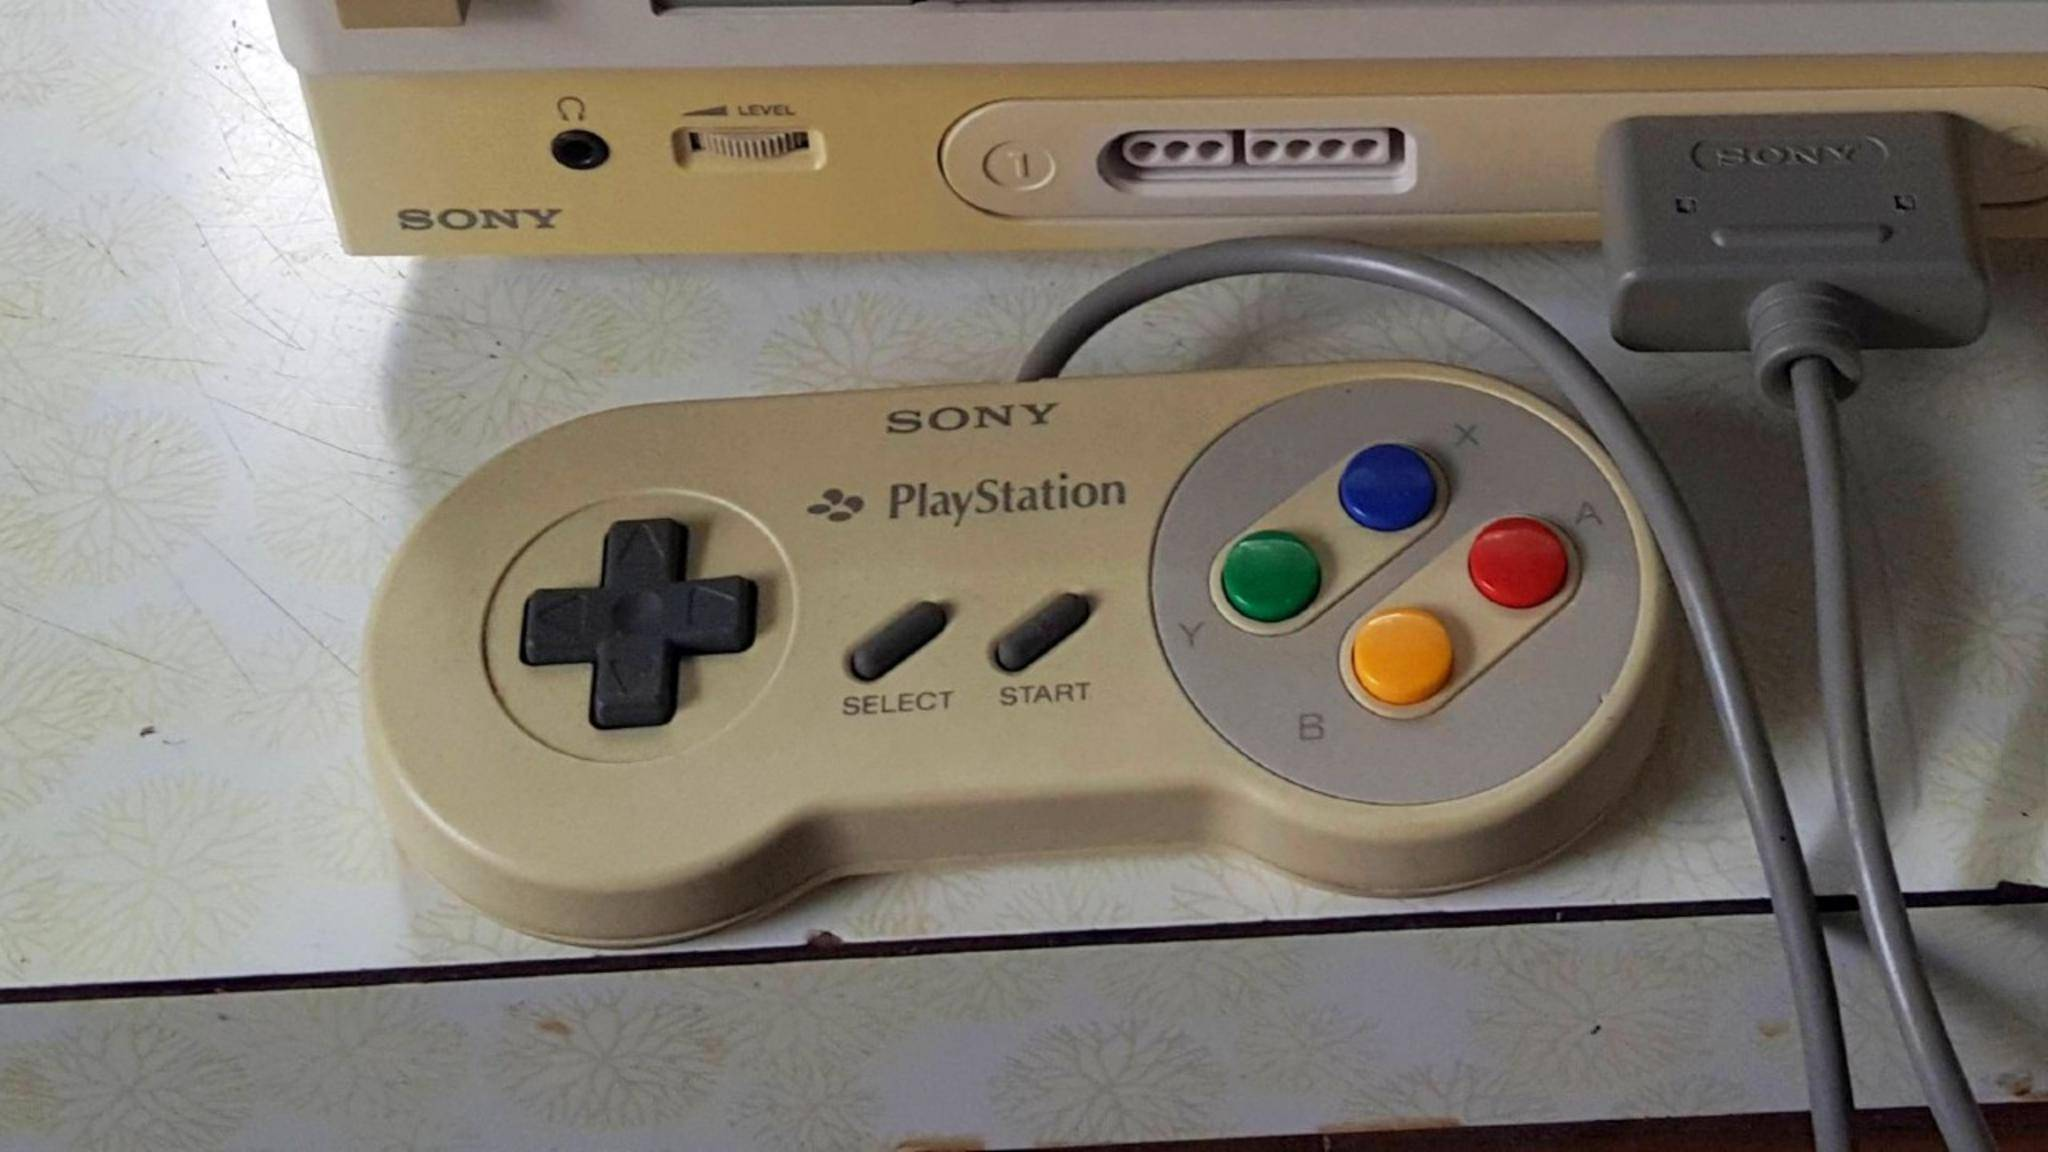 Seltener Prototyp: SNES-Controller mit PlayStation-Schriftzug.